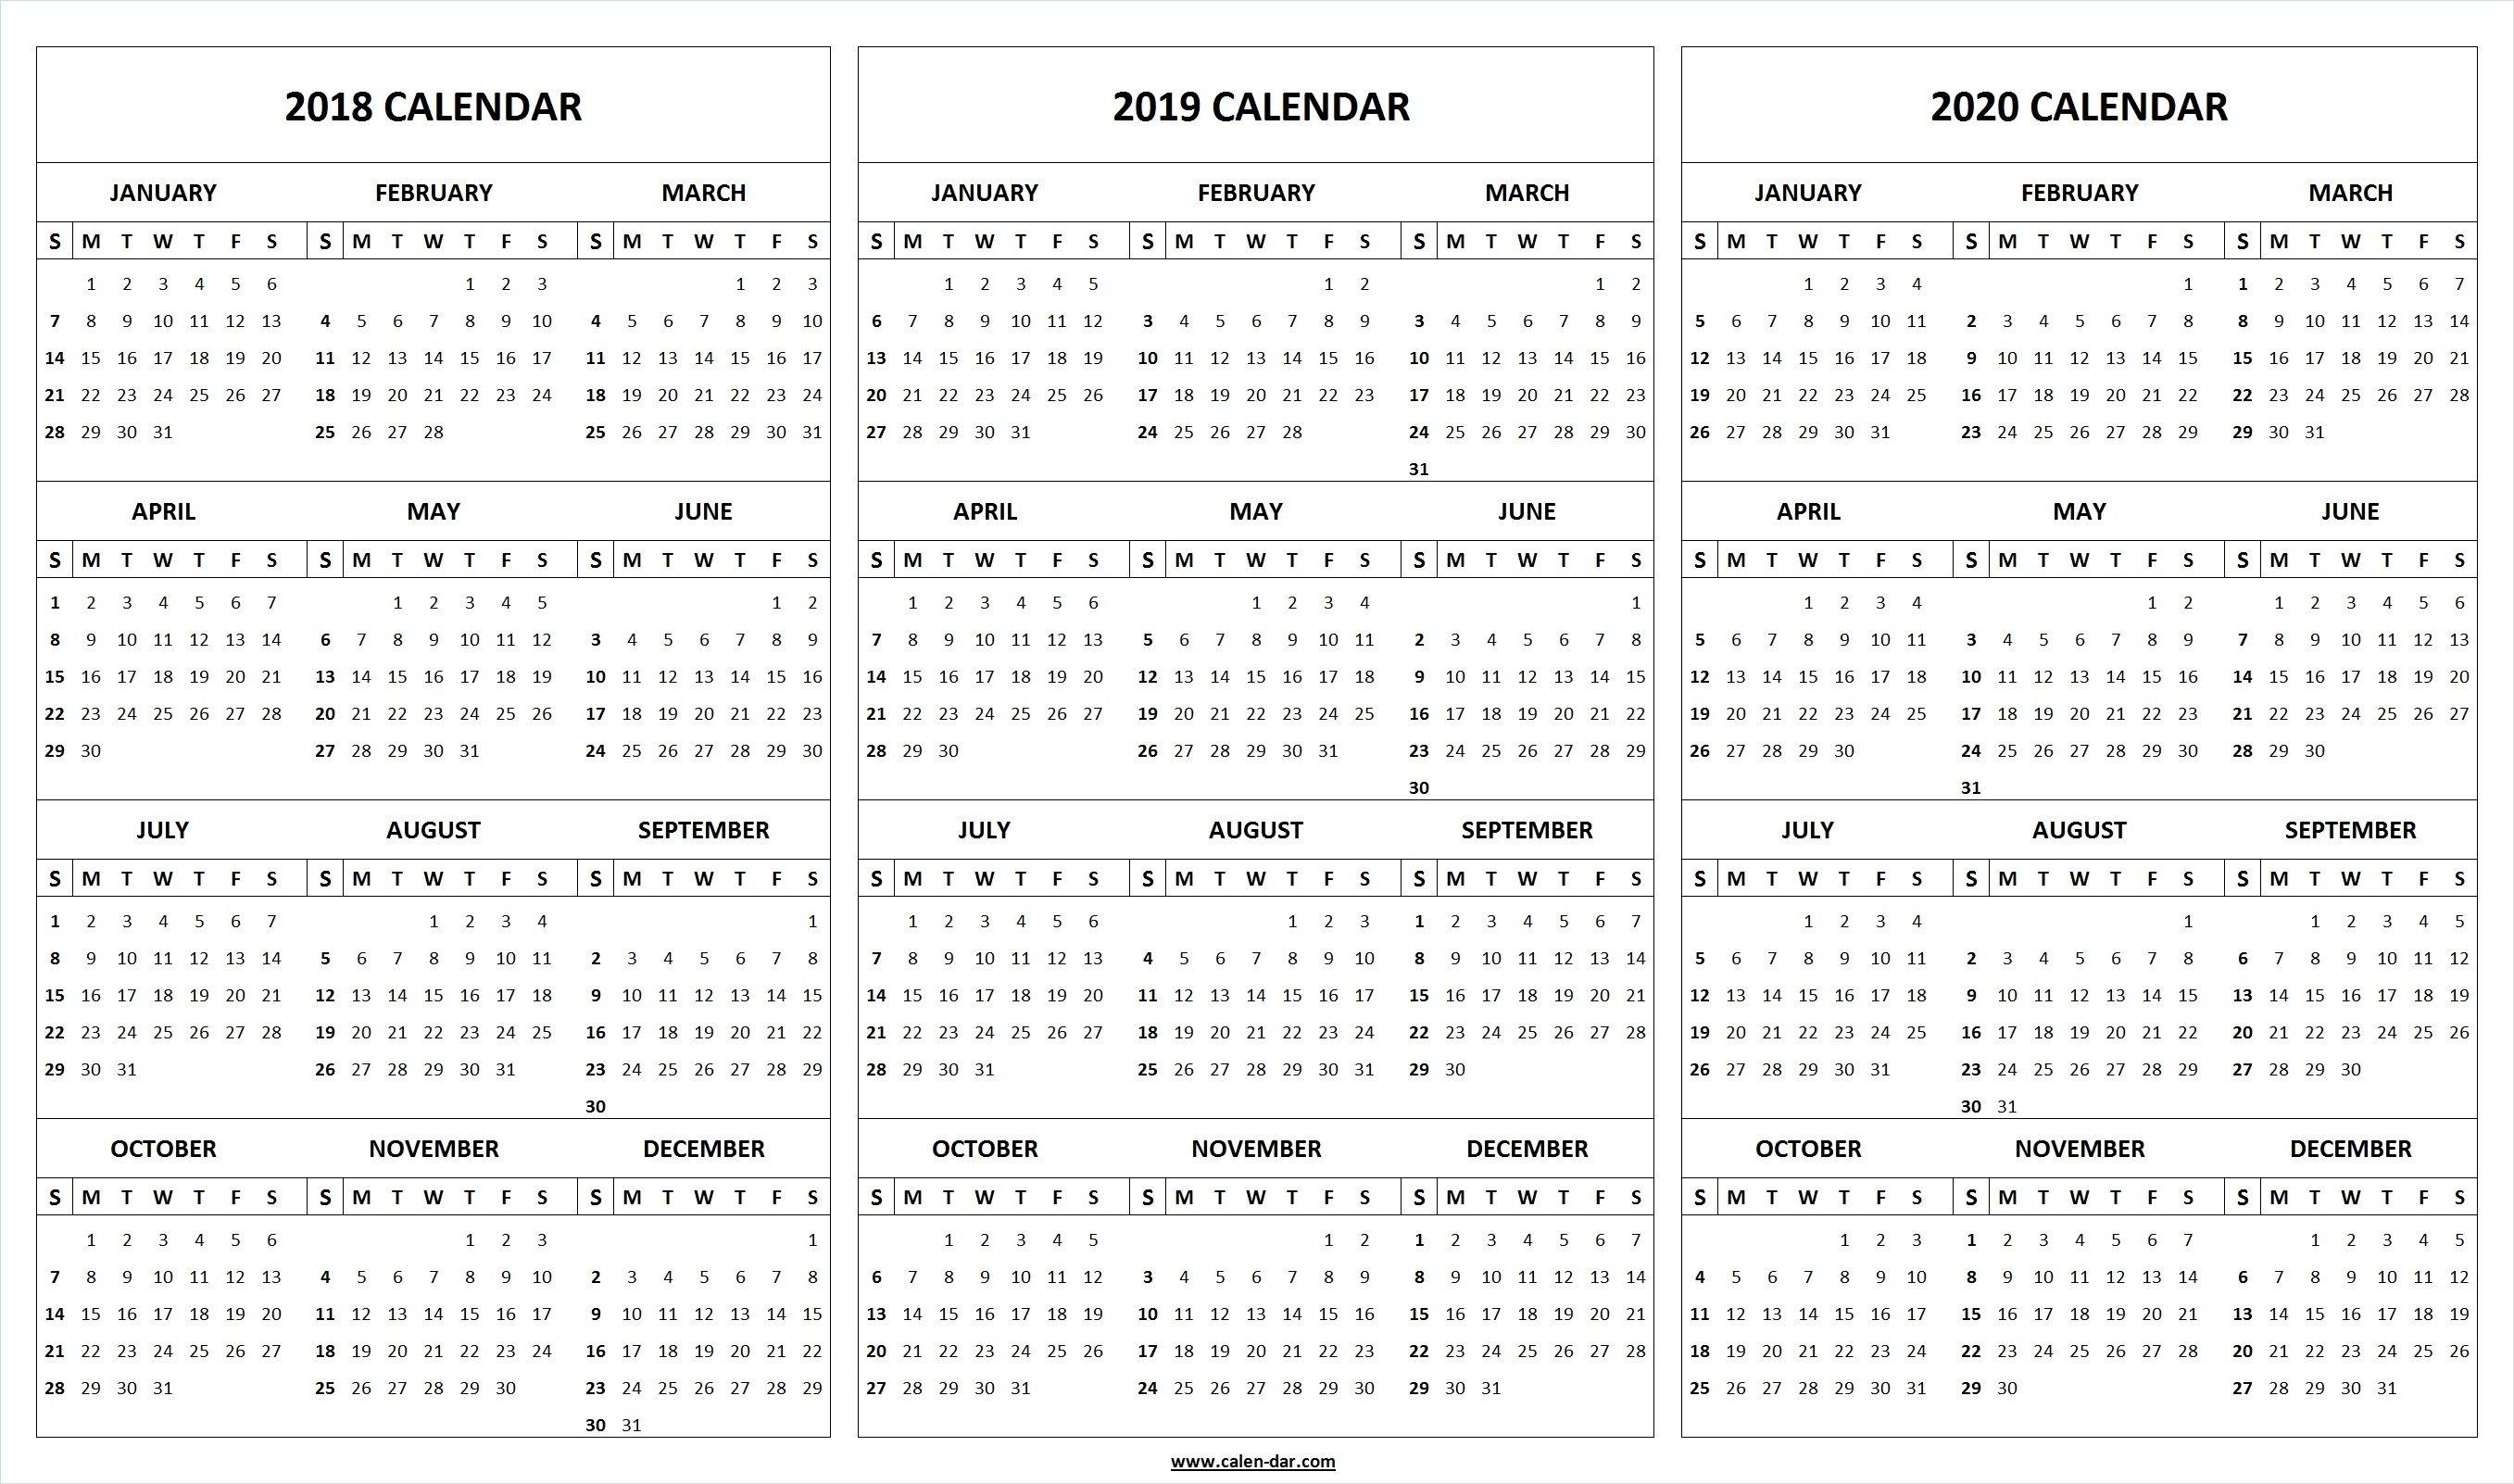 Print Blank 2018 2019 2020 Calendar Template   Organize!   Printable pertaining to Year Long Calendar For 2019-2020 Printable